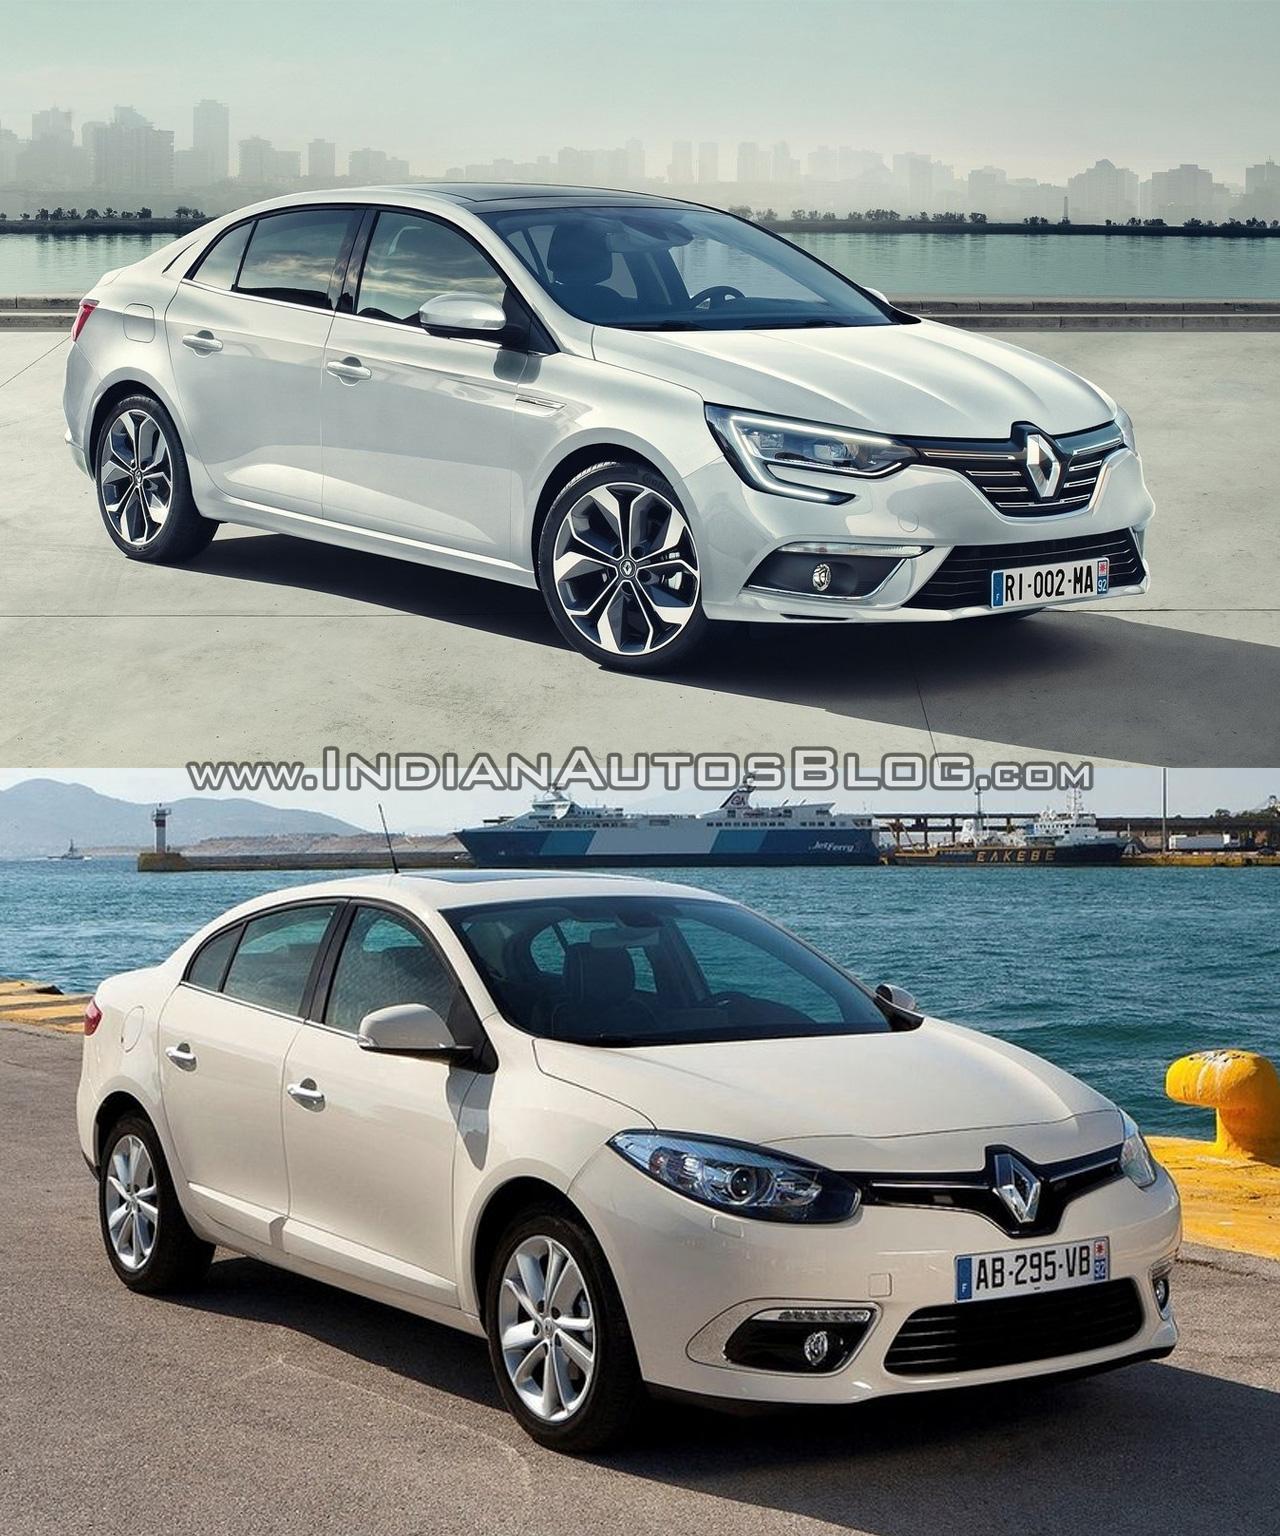 2016 Renault Megane Sedan vs. Renault Fluence front three quarters right side